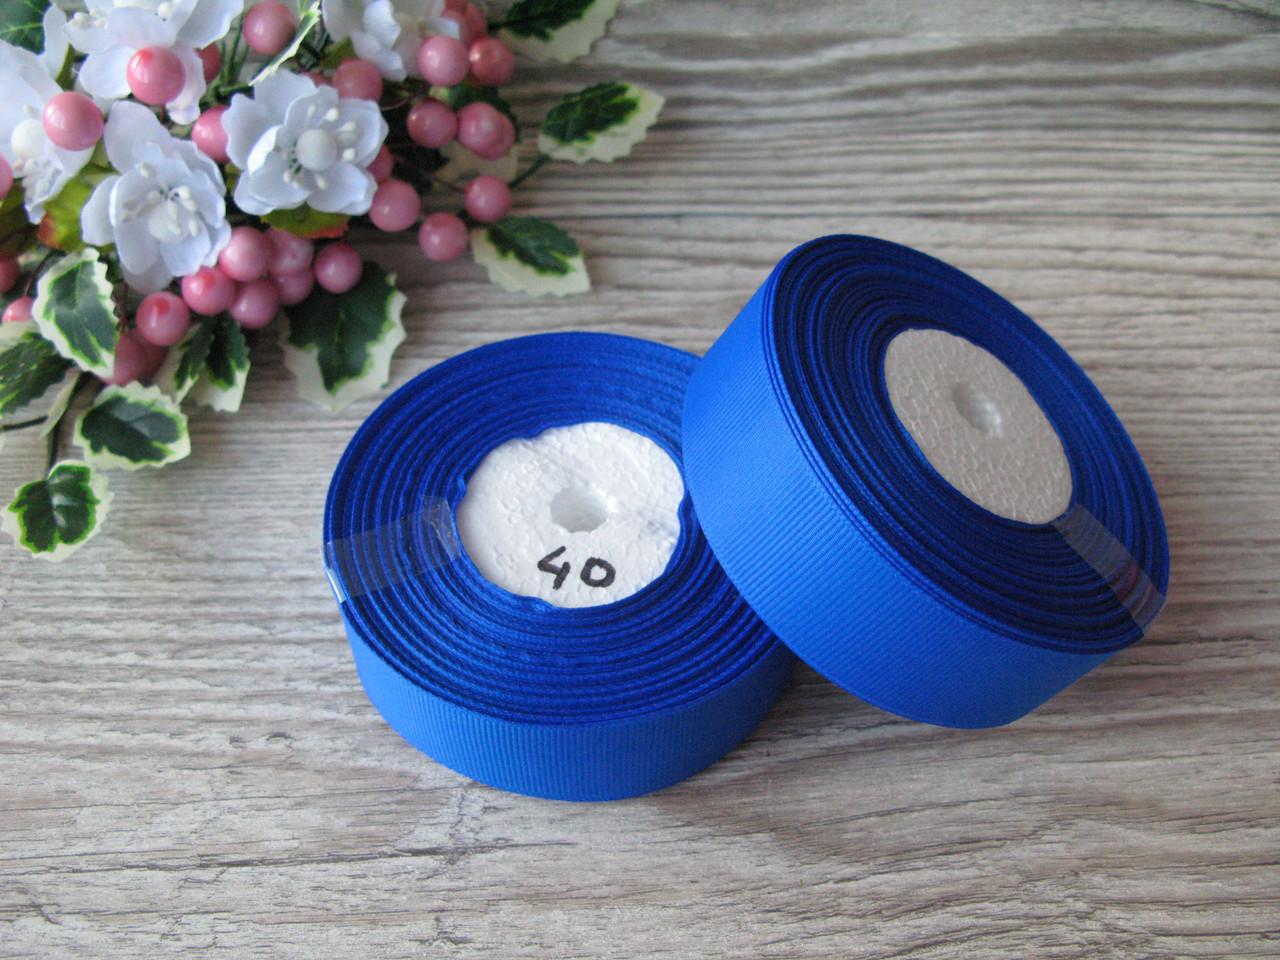 Репс однотонный. Цвет Синий.  Ширина 2.5 см бобина - 18 м